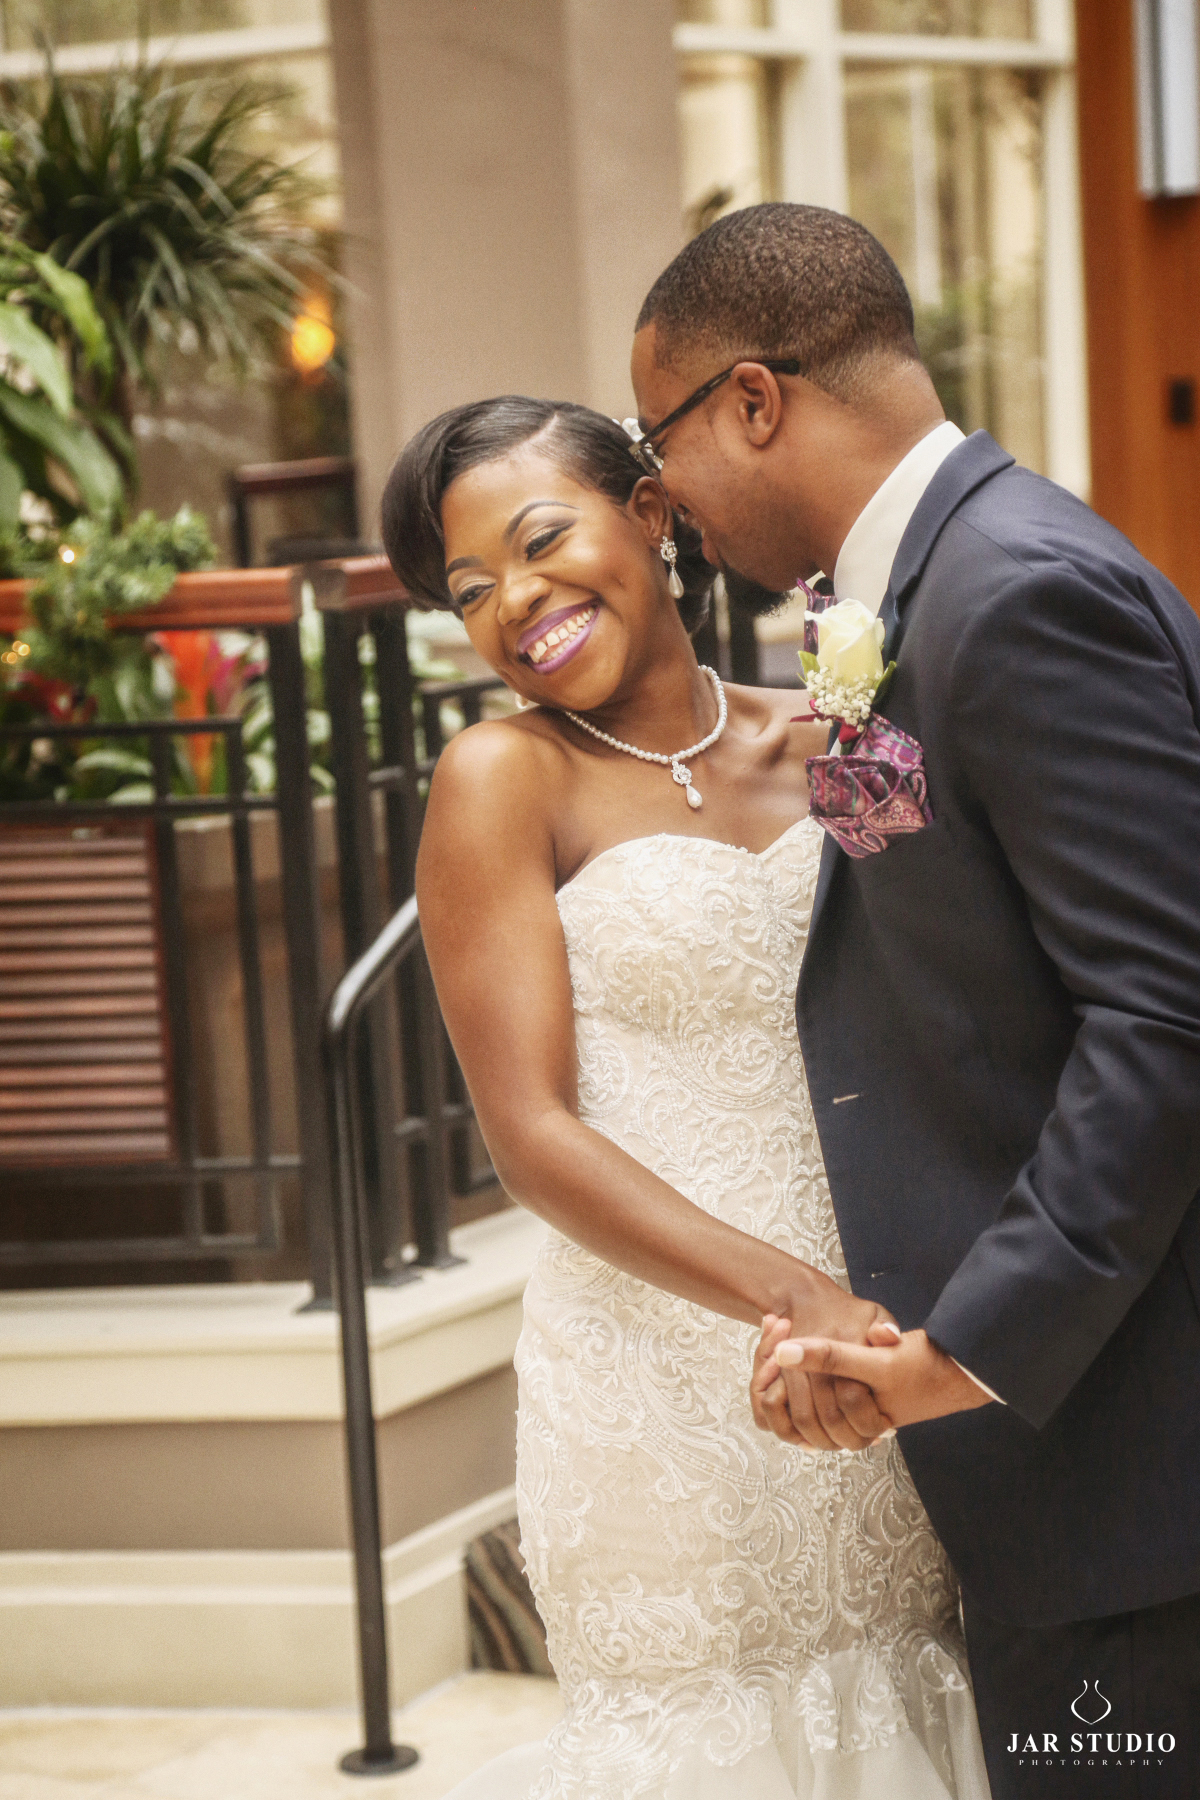 16-fun-quirky-idea-jarstudio-wedding-photographer.JPG